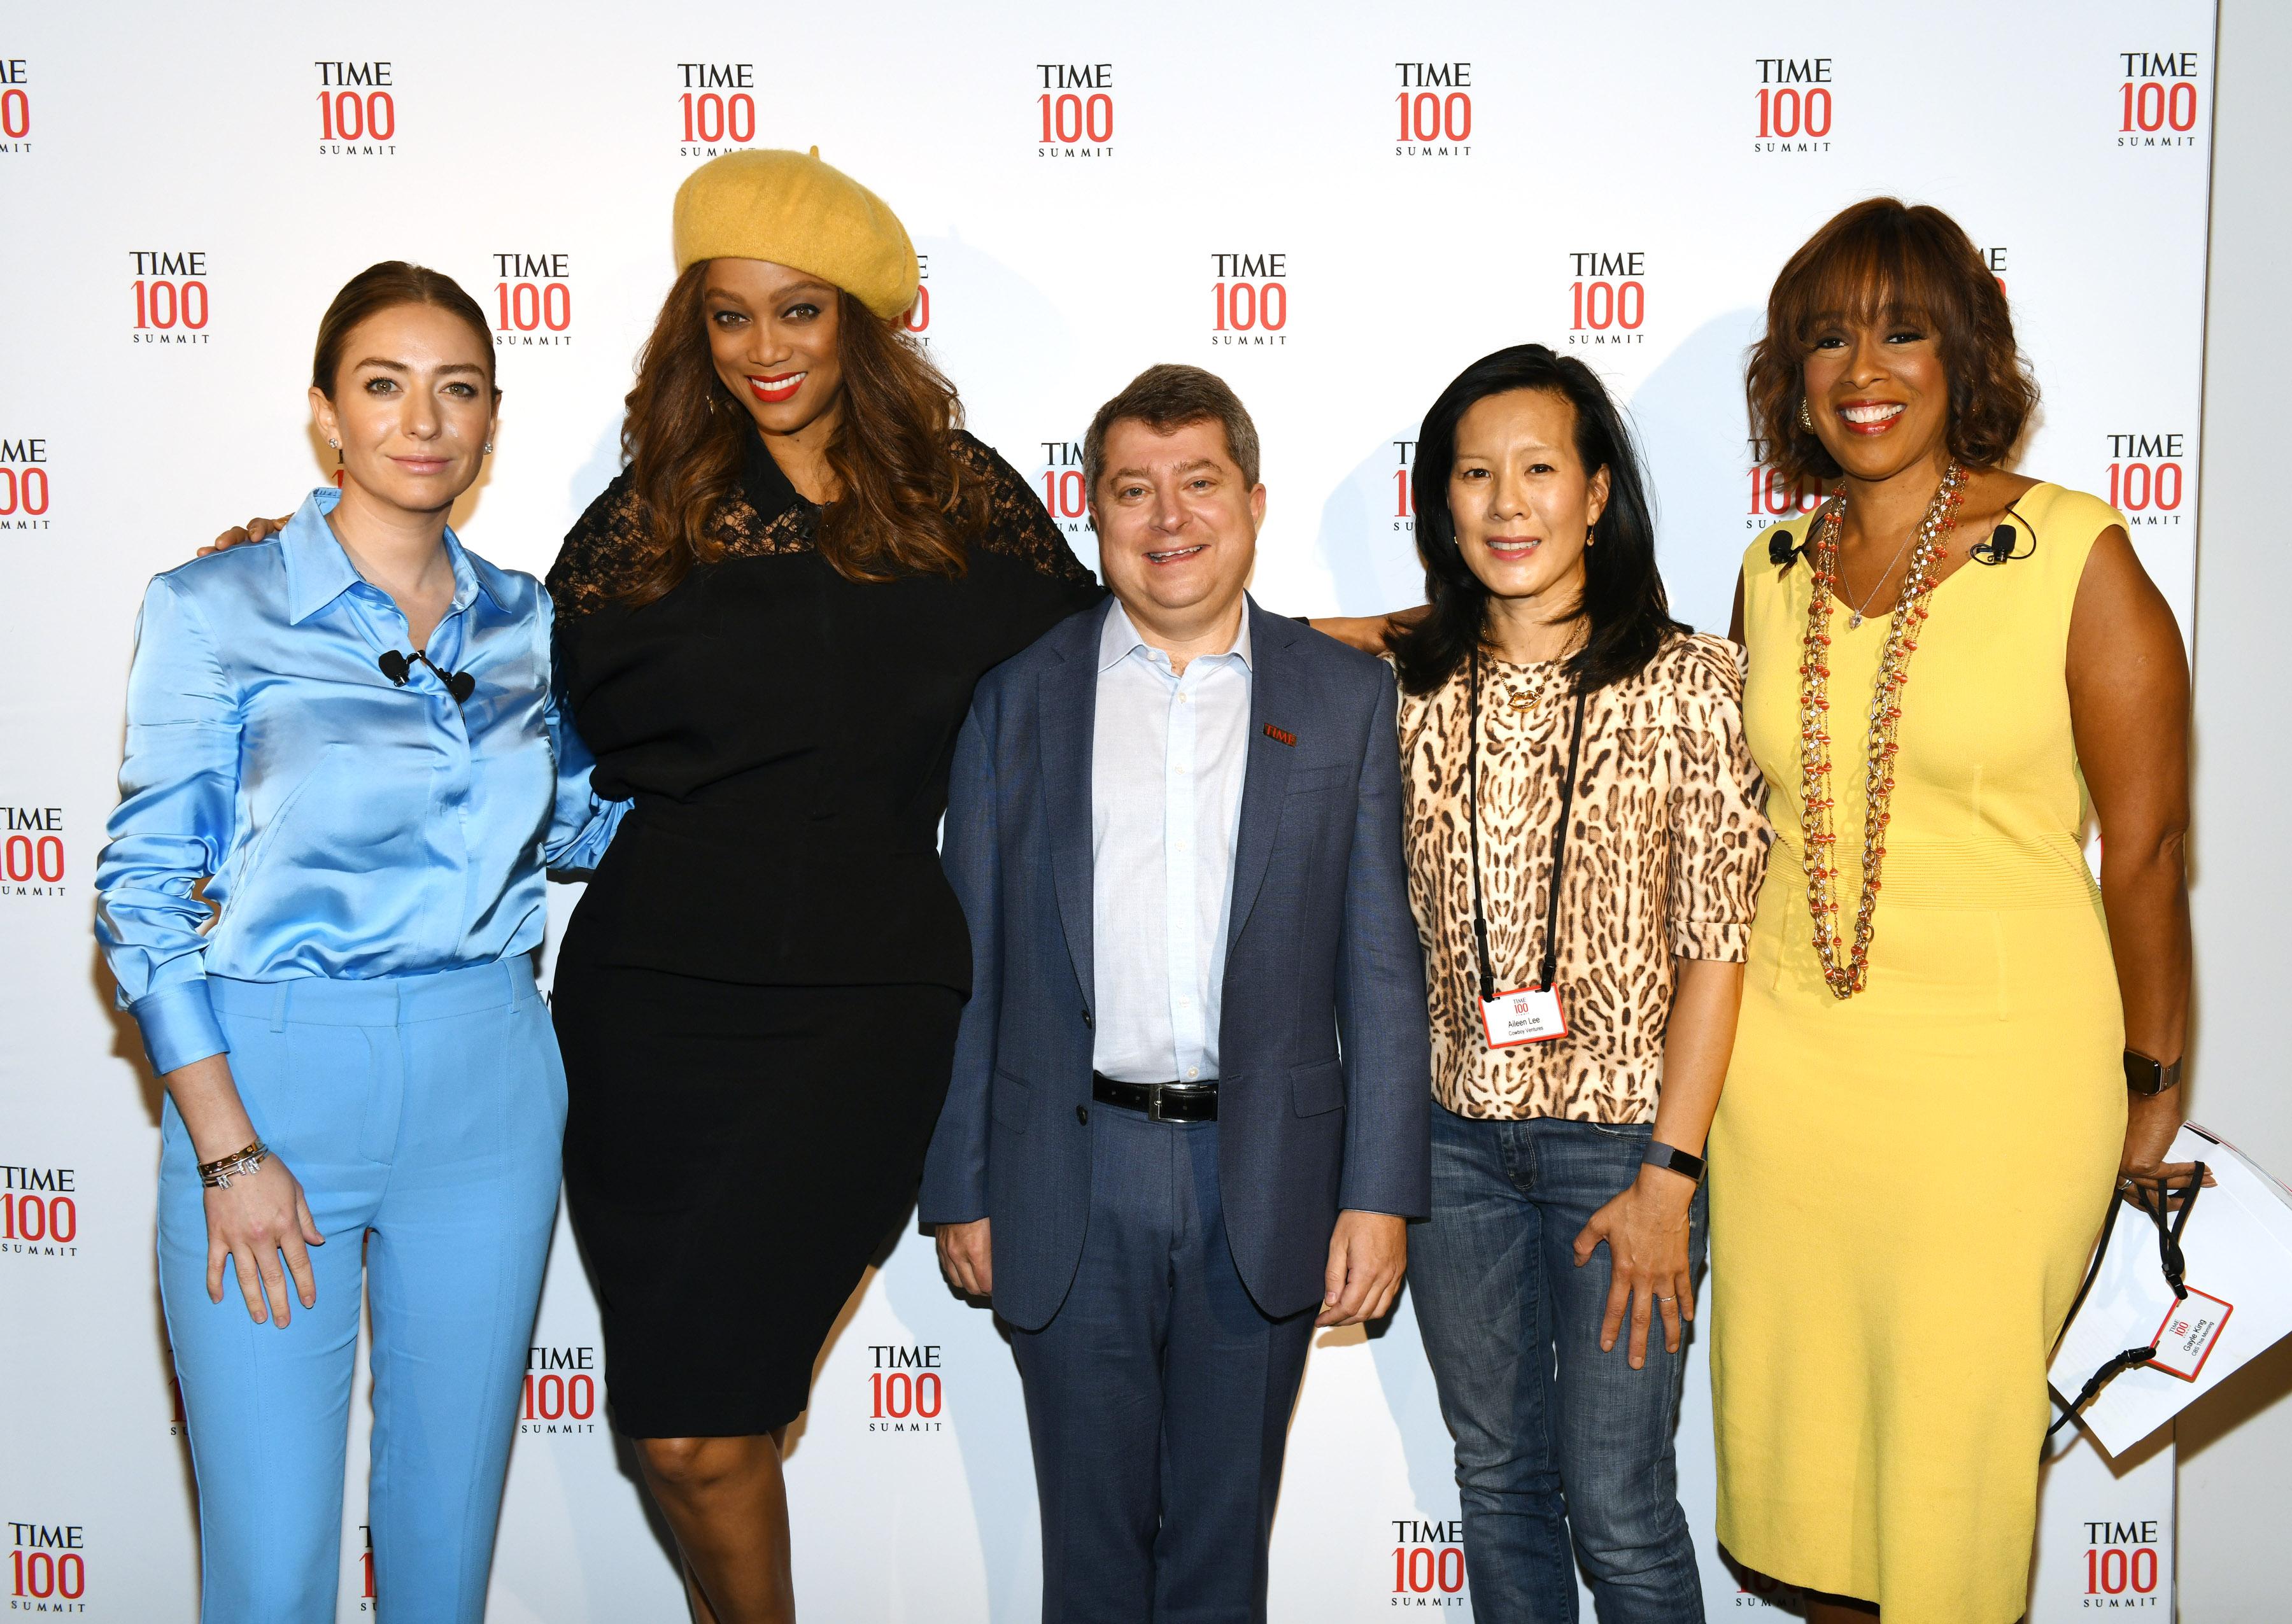 TIME 100 Summit 2019